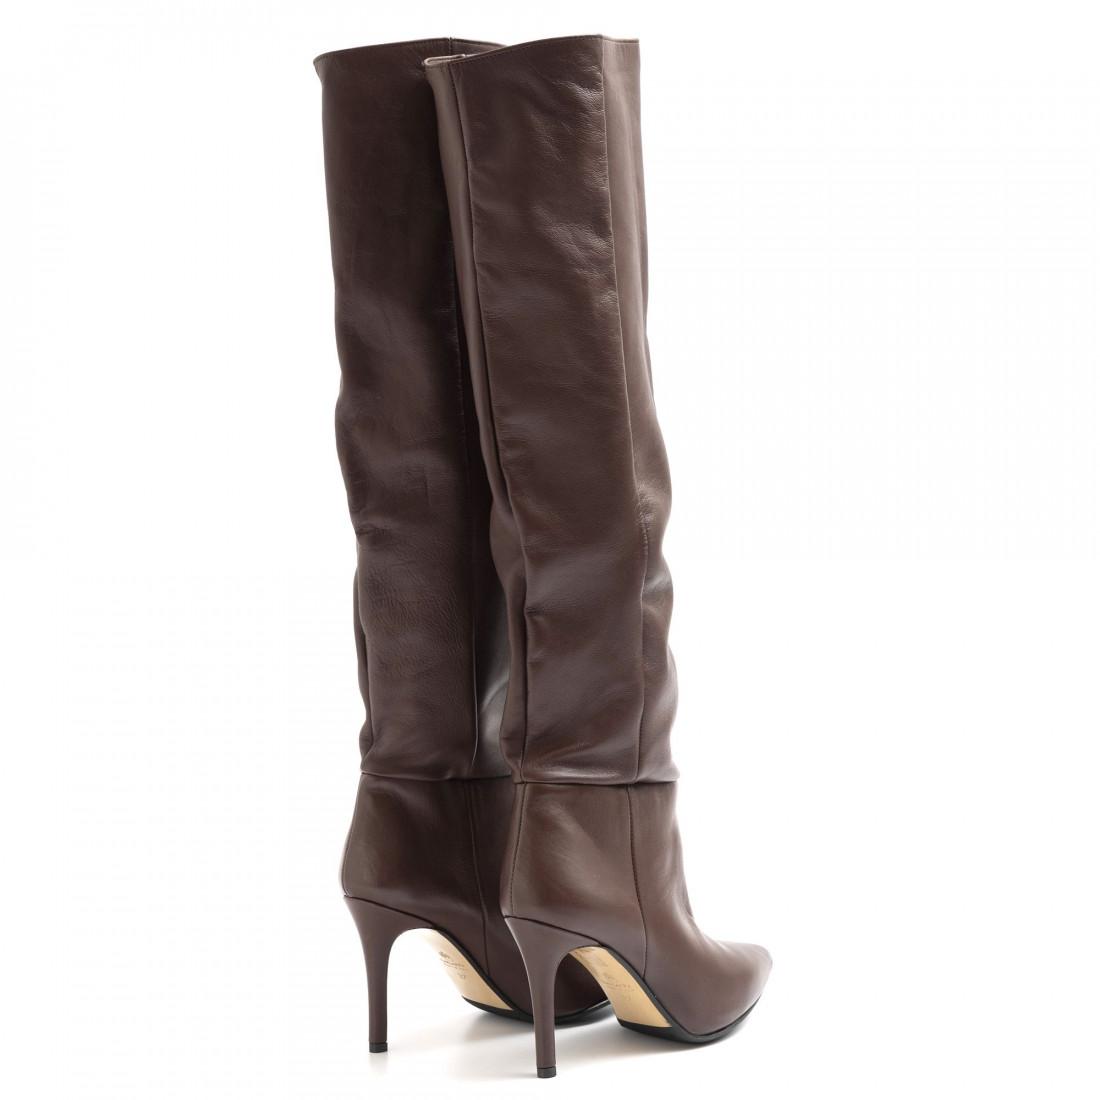 boots woman larianna st 1175piuma moro 6292